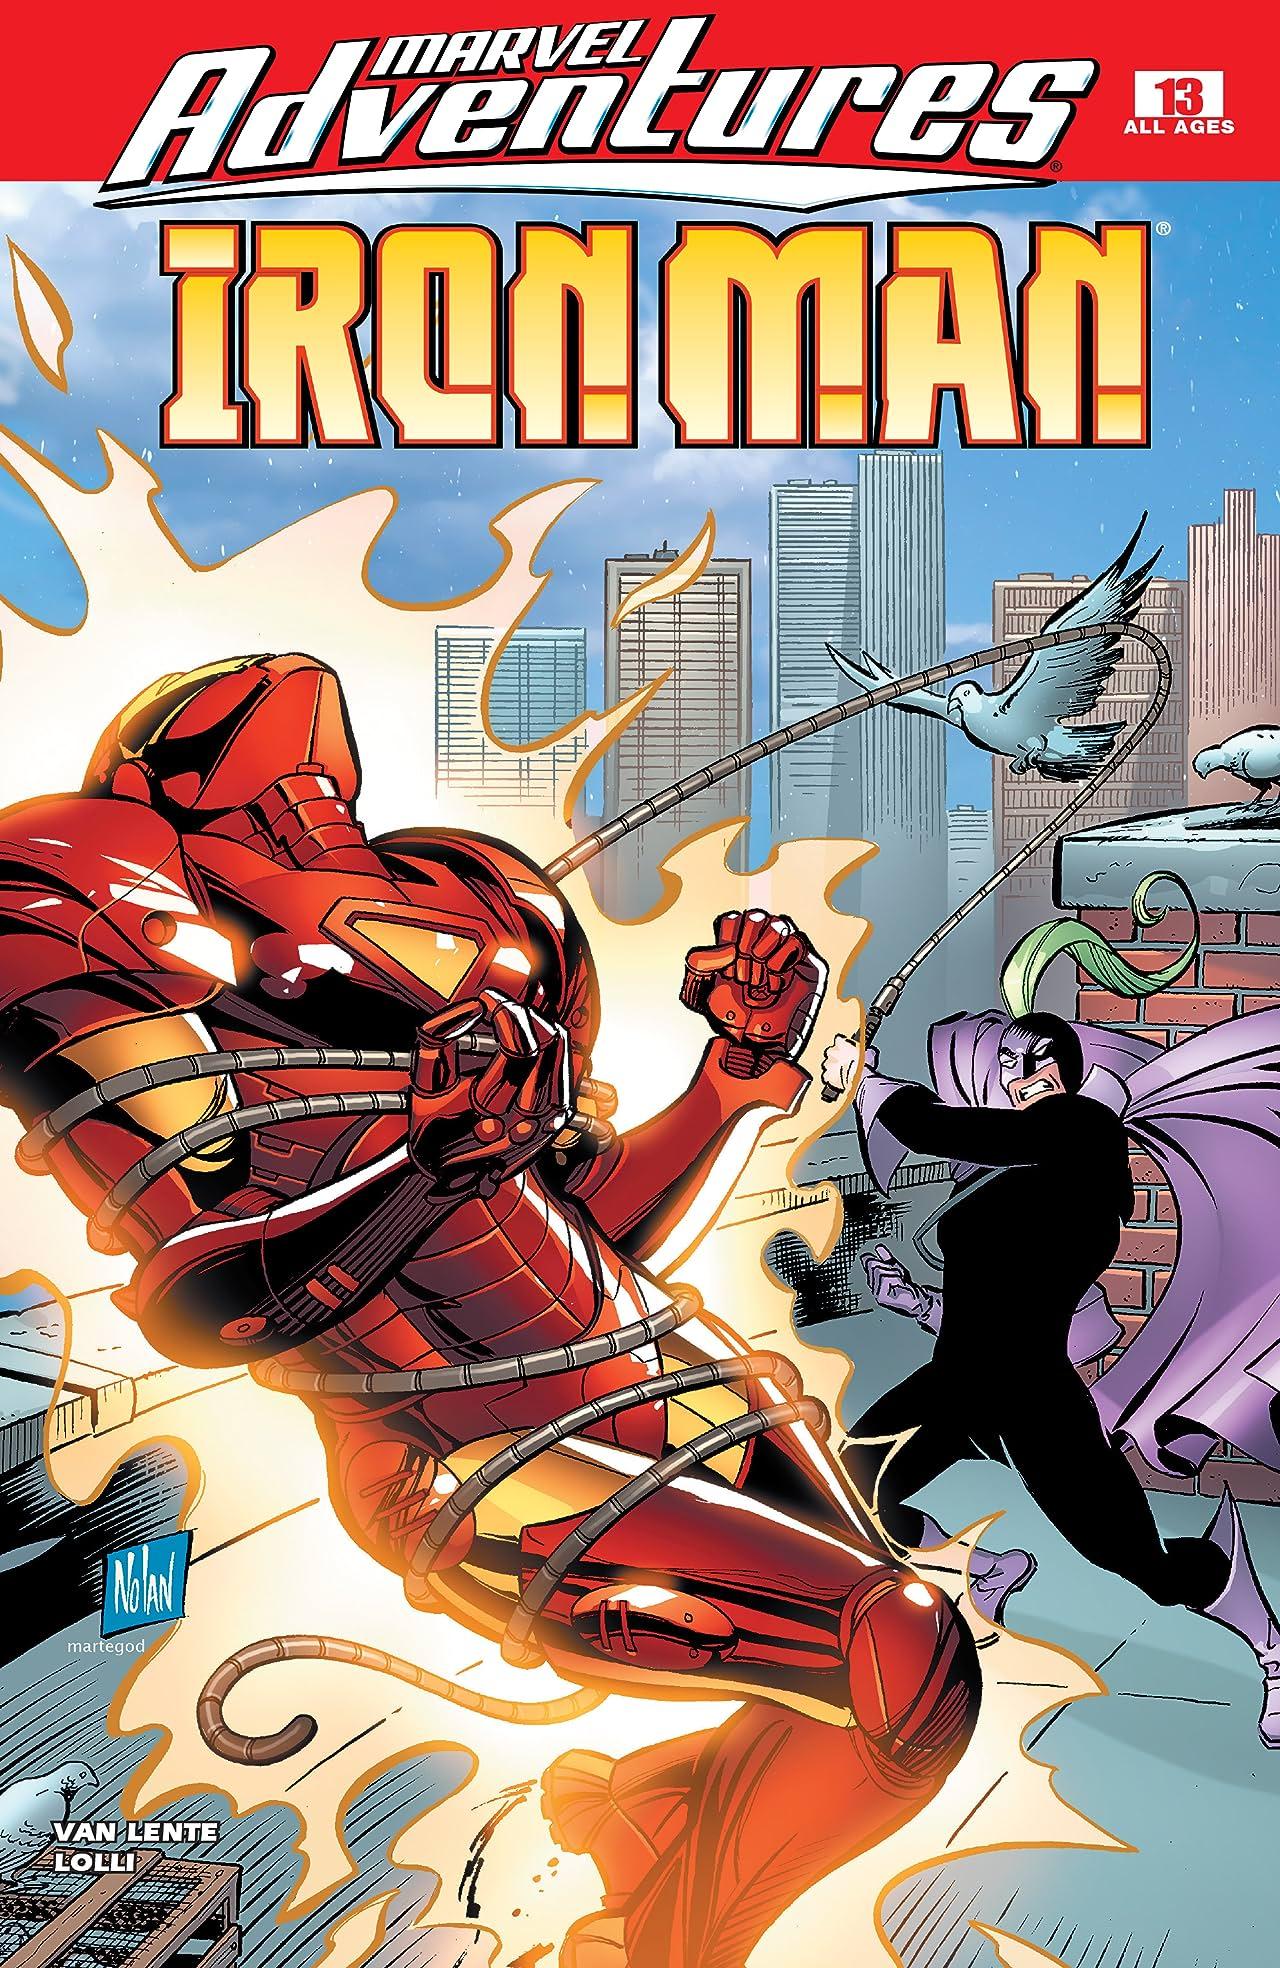 Marvel Adventures Iron Man (2007-2008) #13